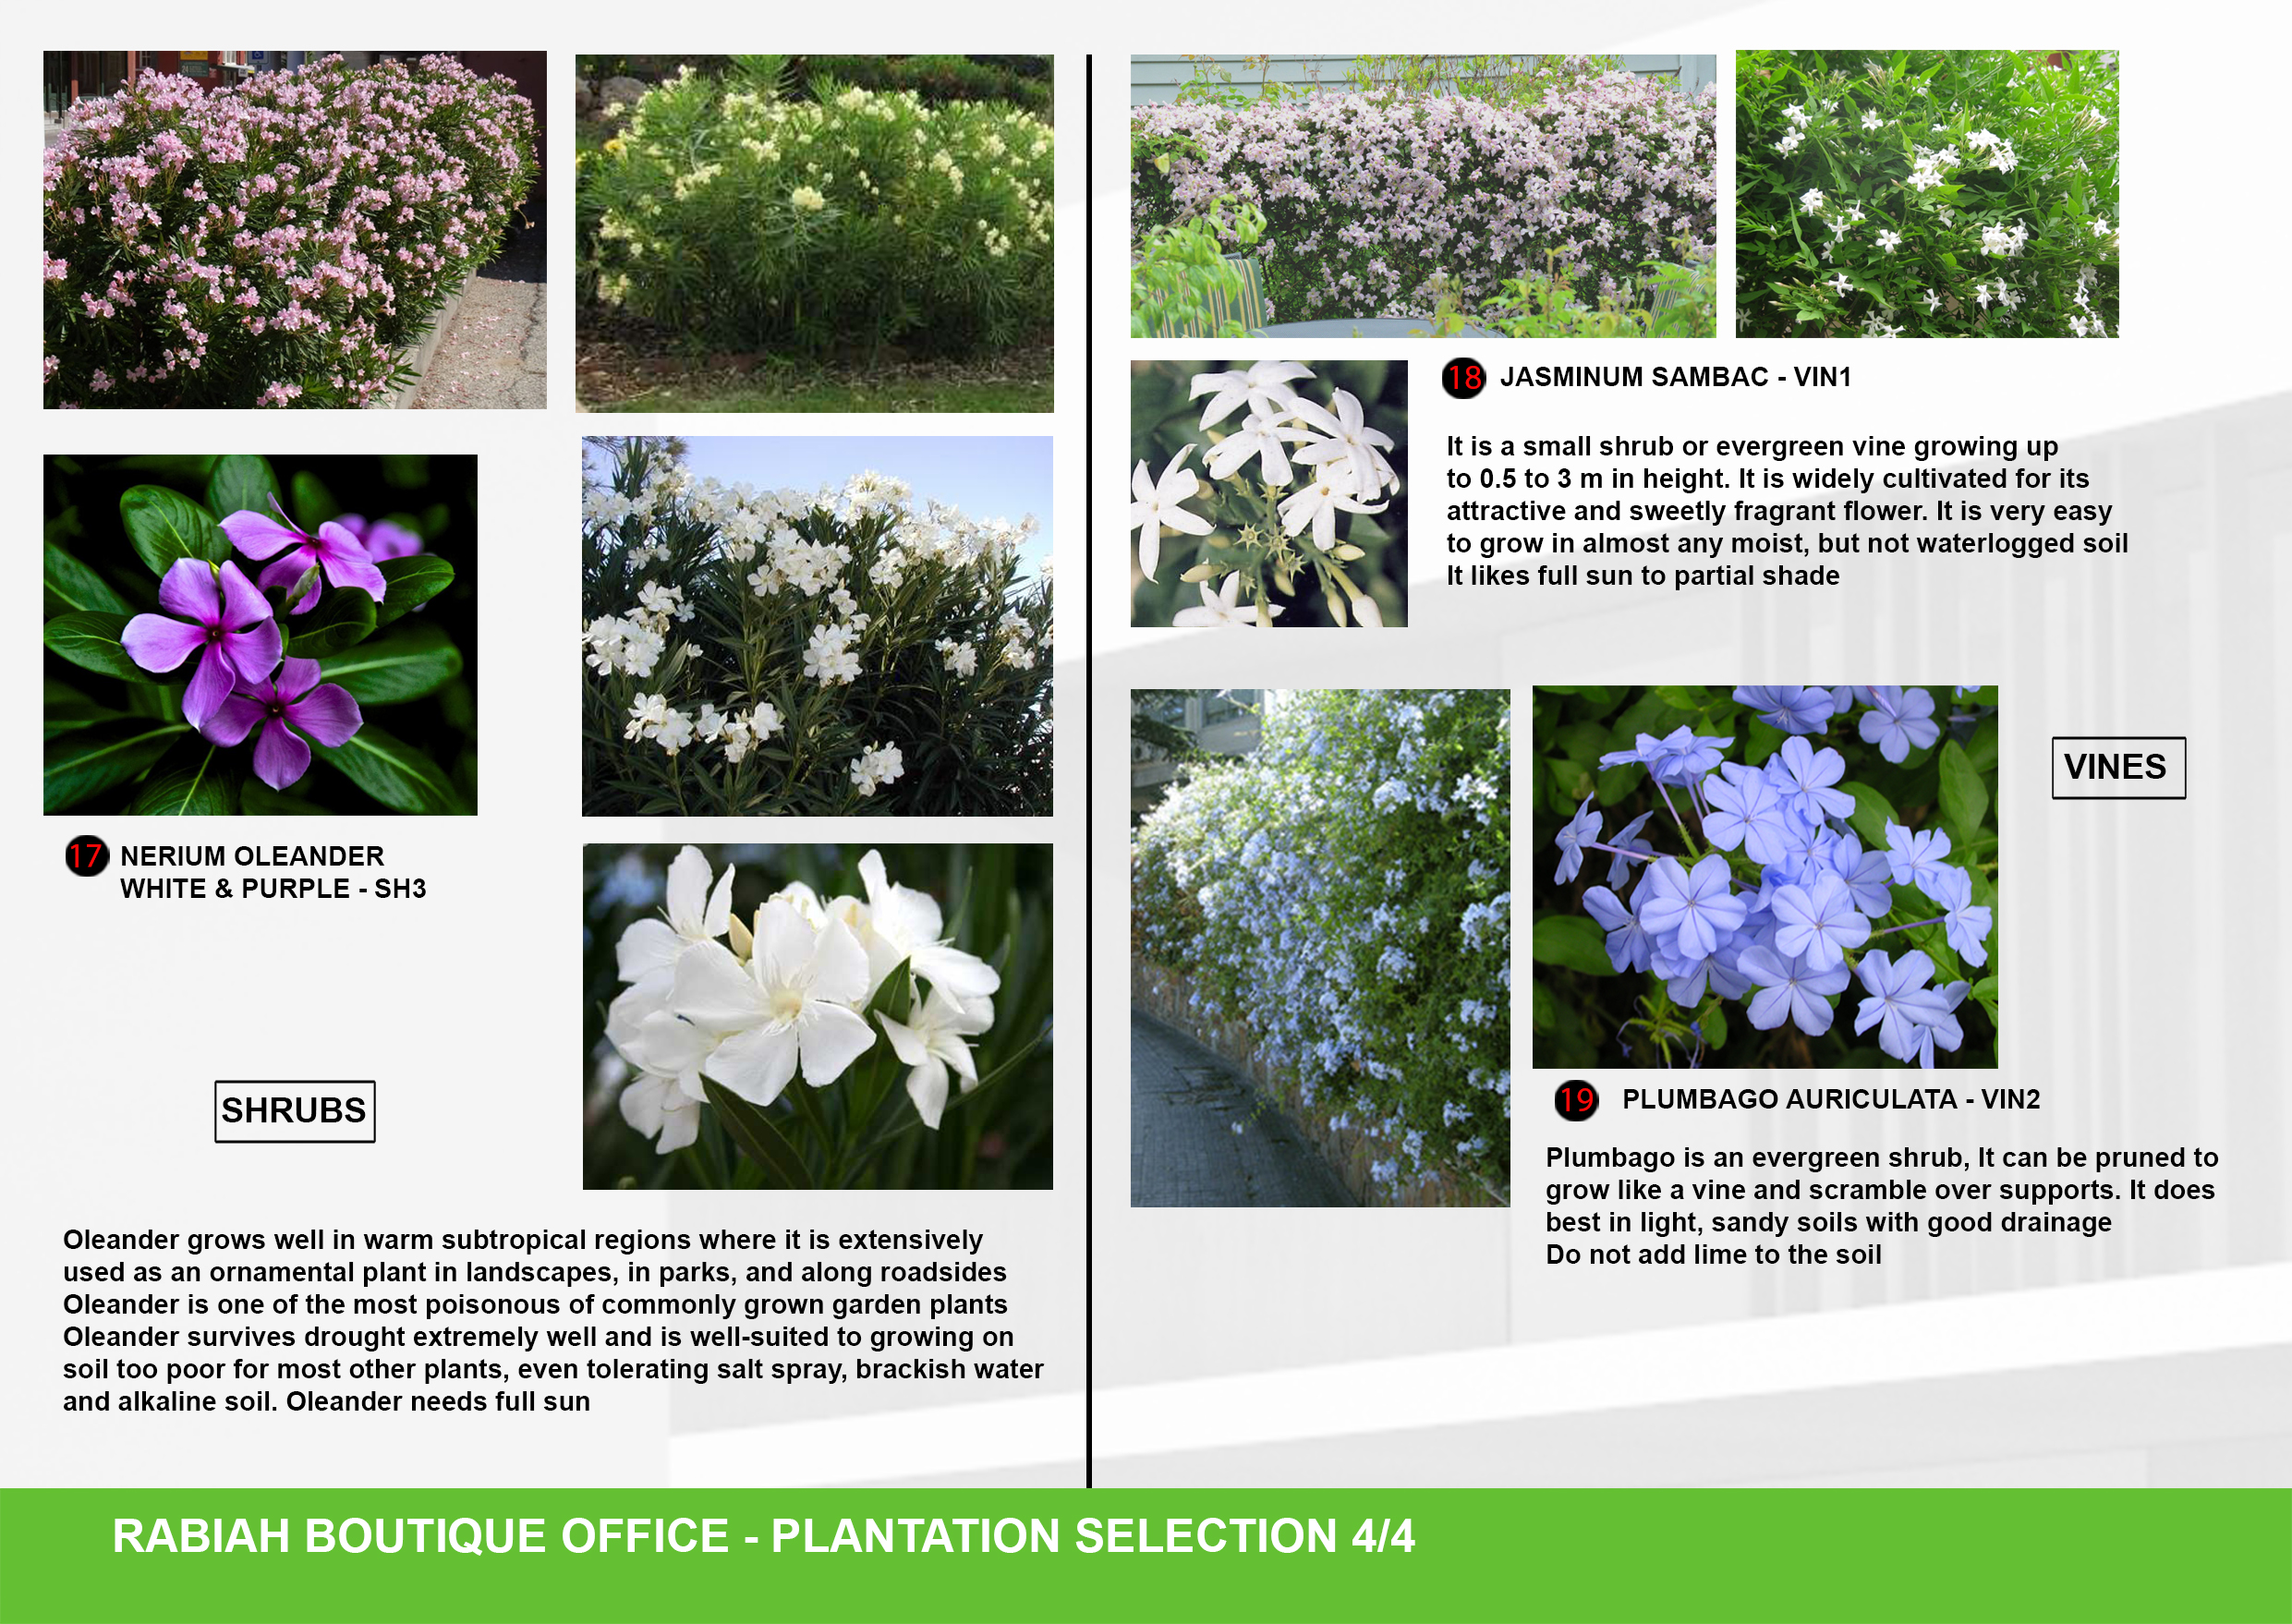 10-A3-Plantation Selection 04